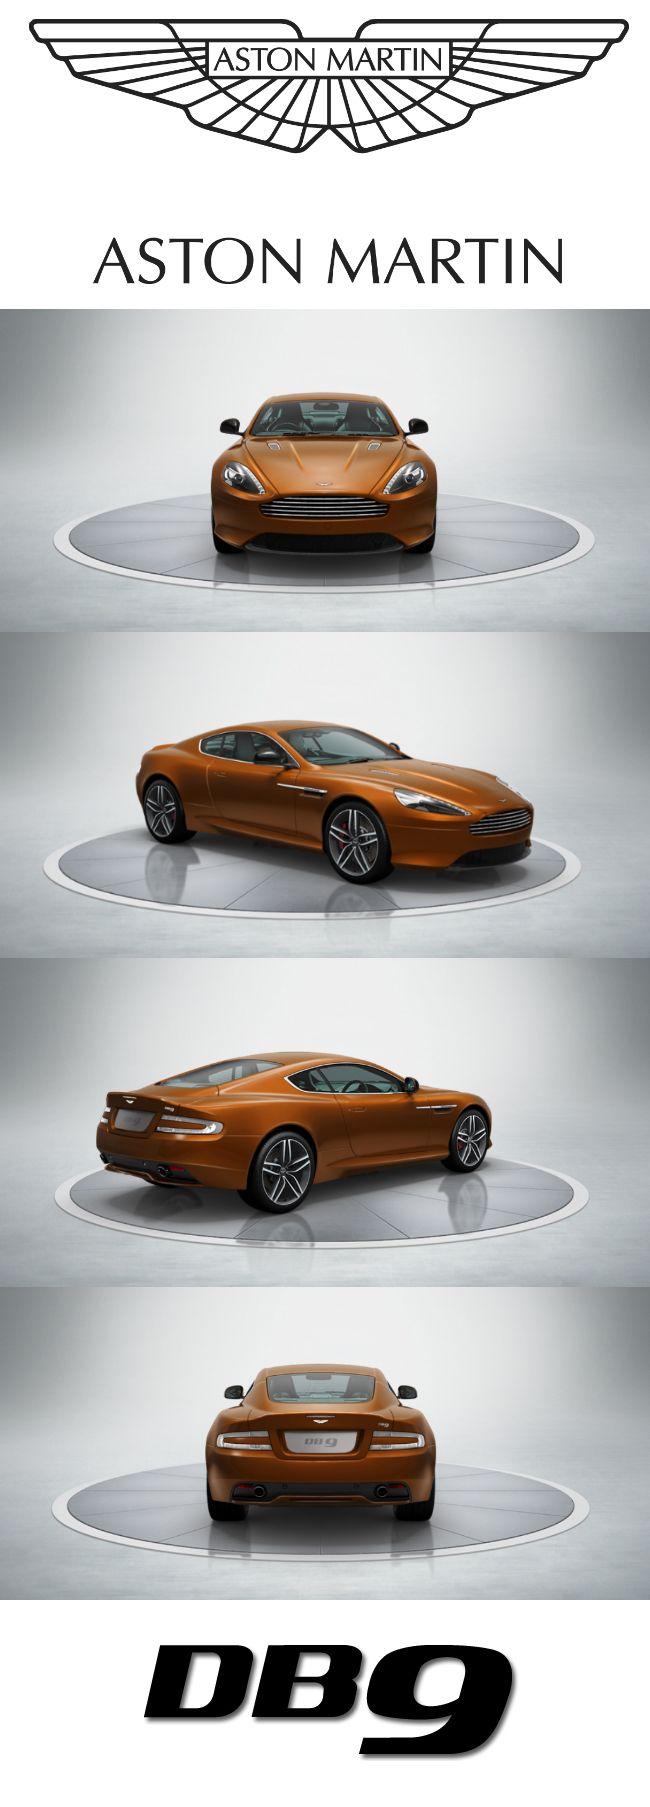 Aston Martin DB9. Design your dream Aston Martin with our configurator. http://www.astonmartin.com/configure #AstonMartin